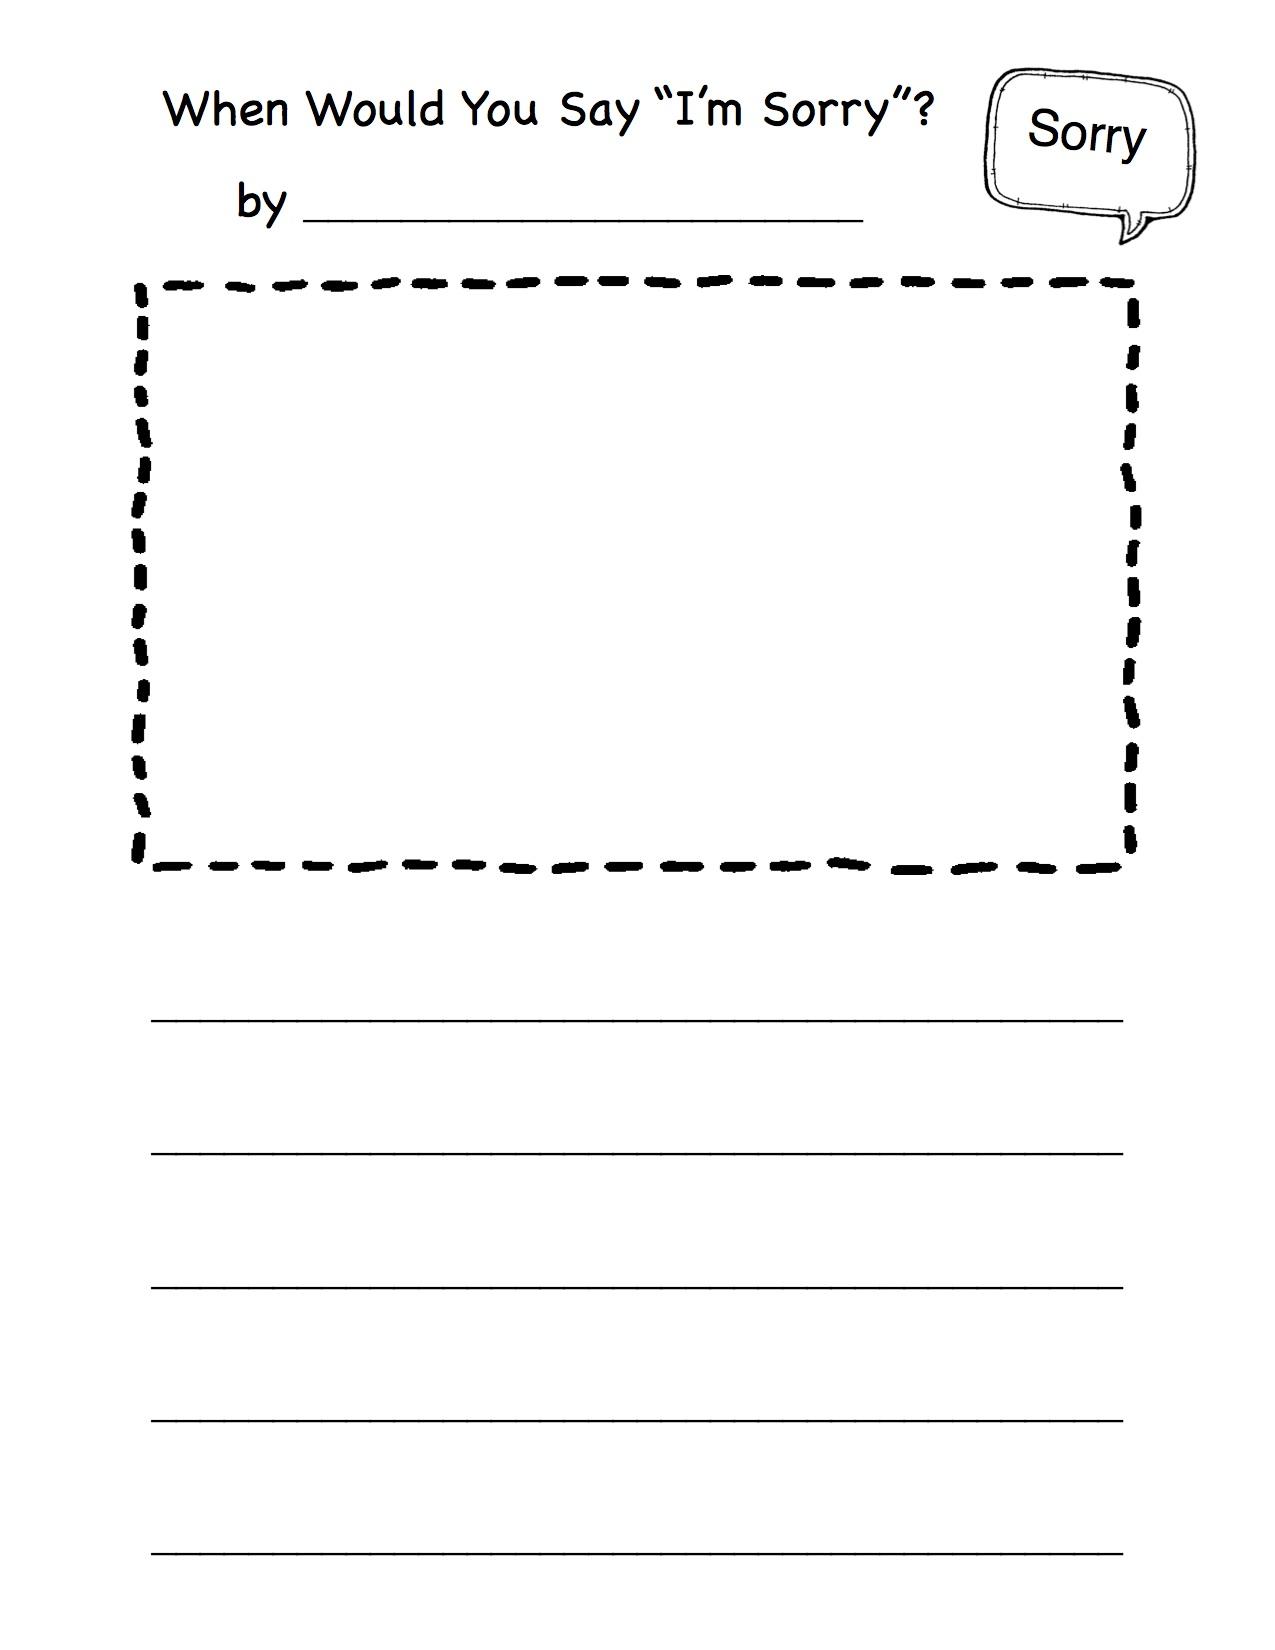 Kindergarten writing paper clipart graphic black and white Kindergarten writing paper clipart - ClipartFest graphic black and white